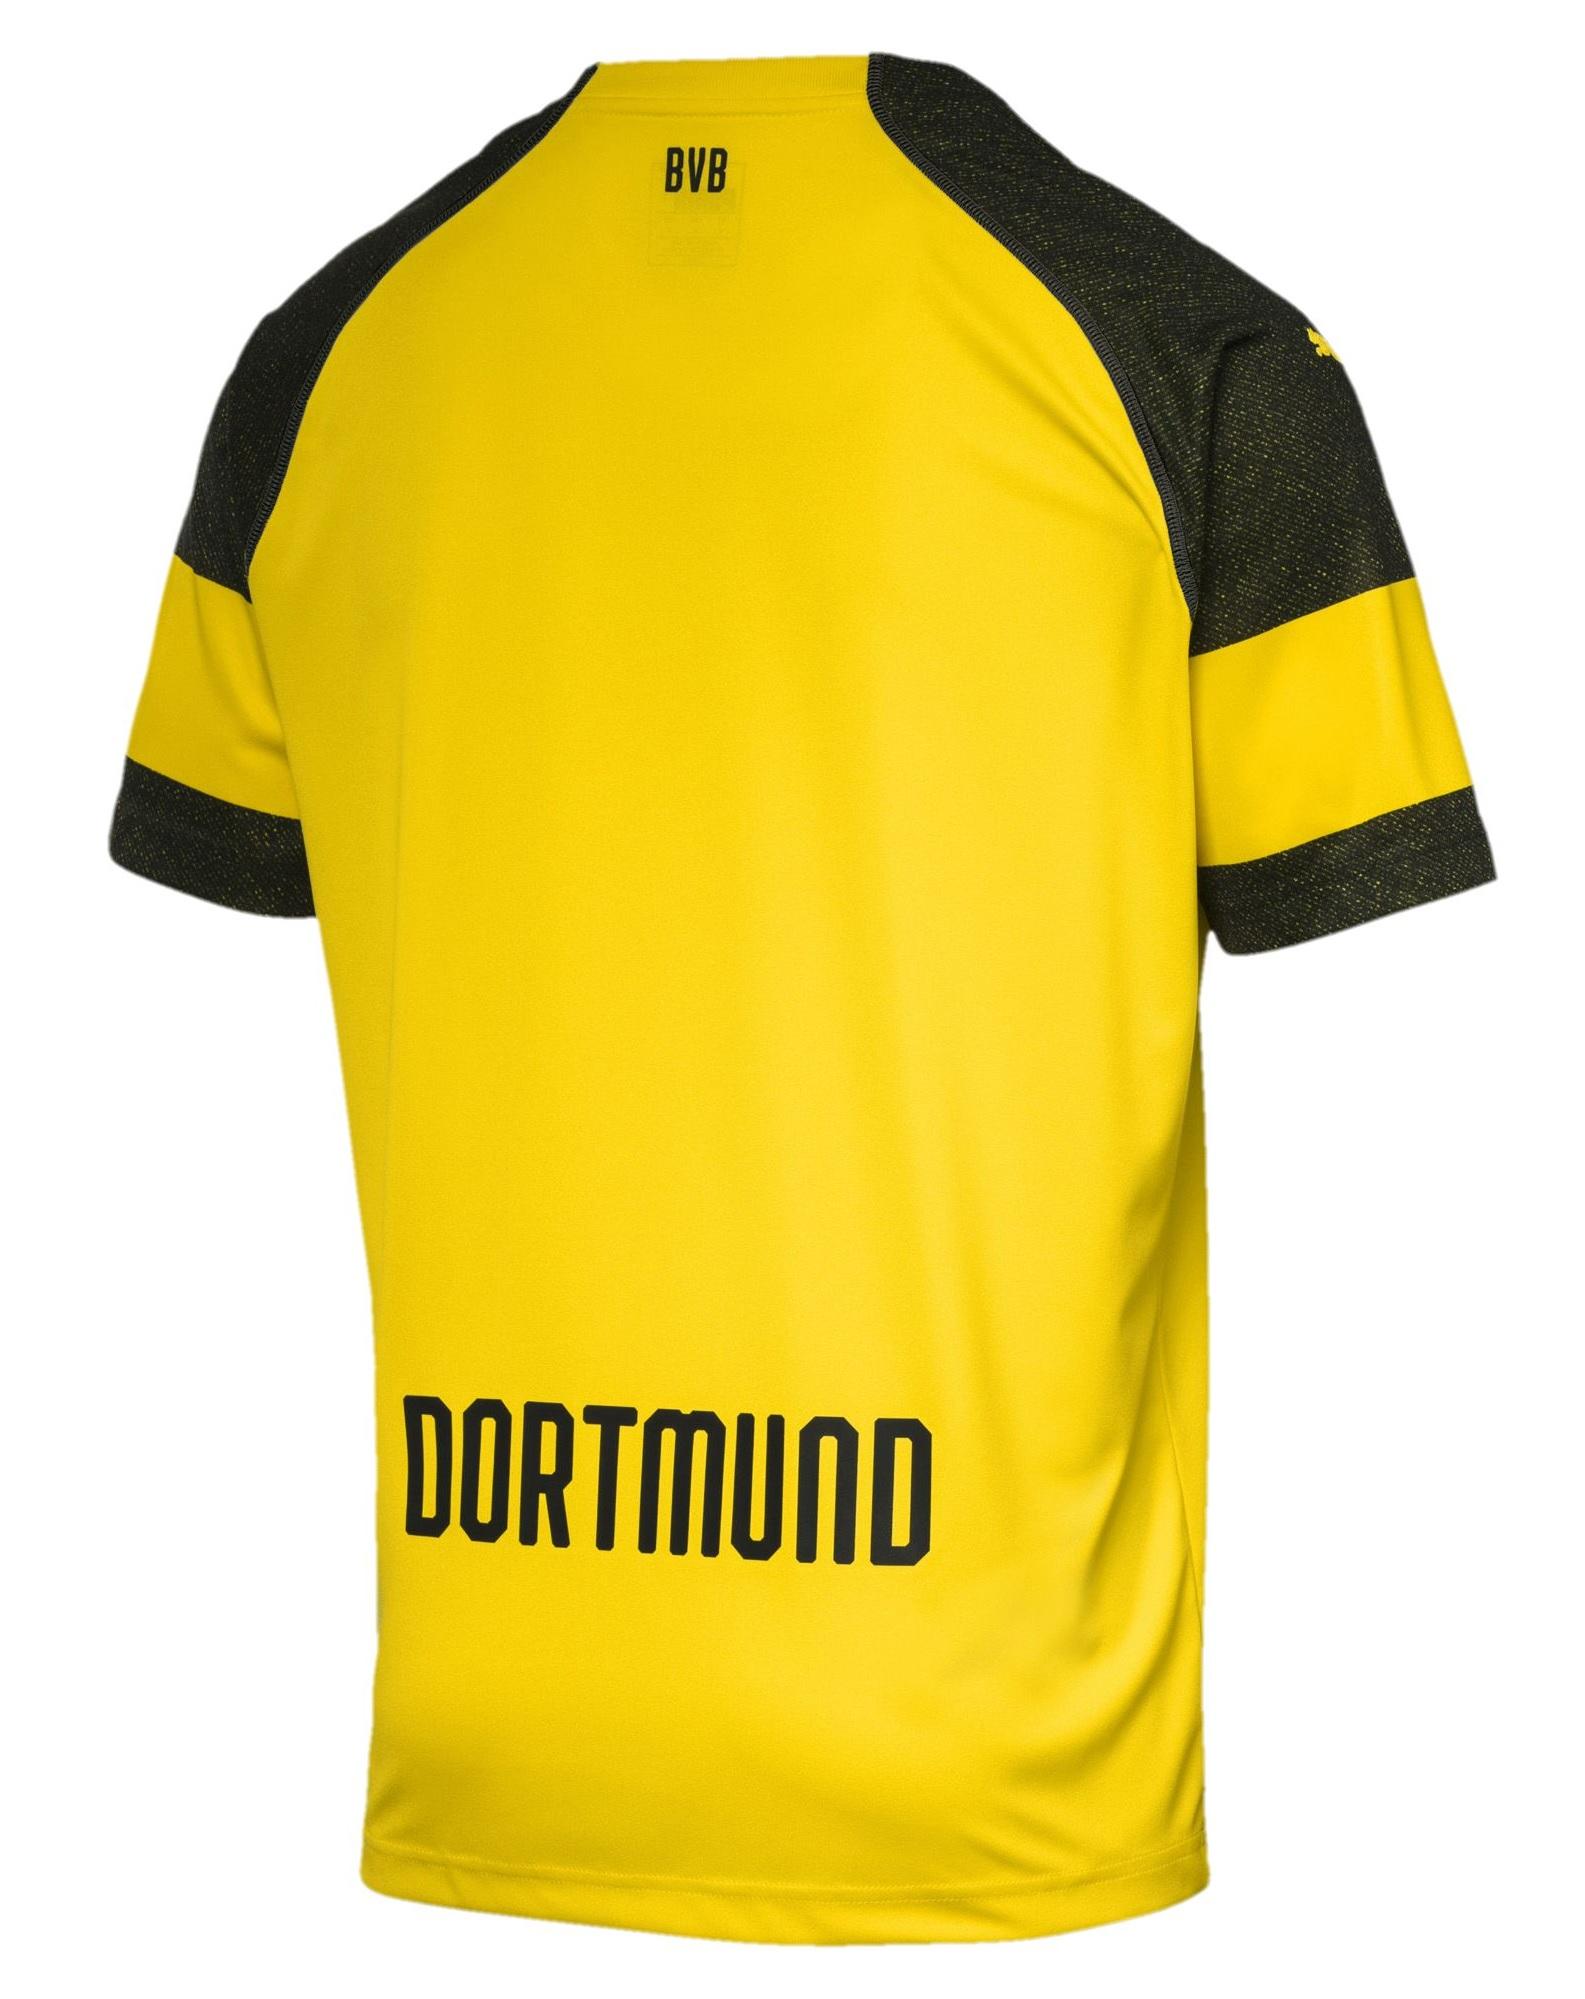 Borussia Dortmund shirt 2019